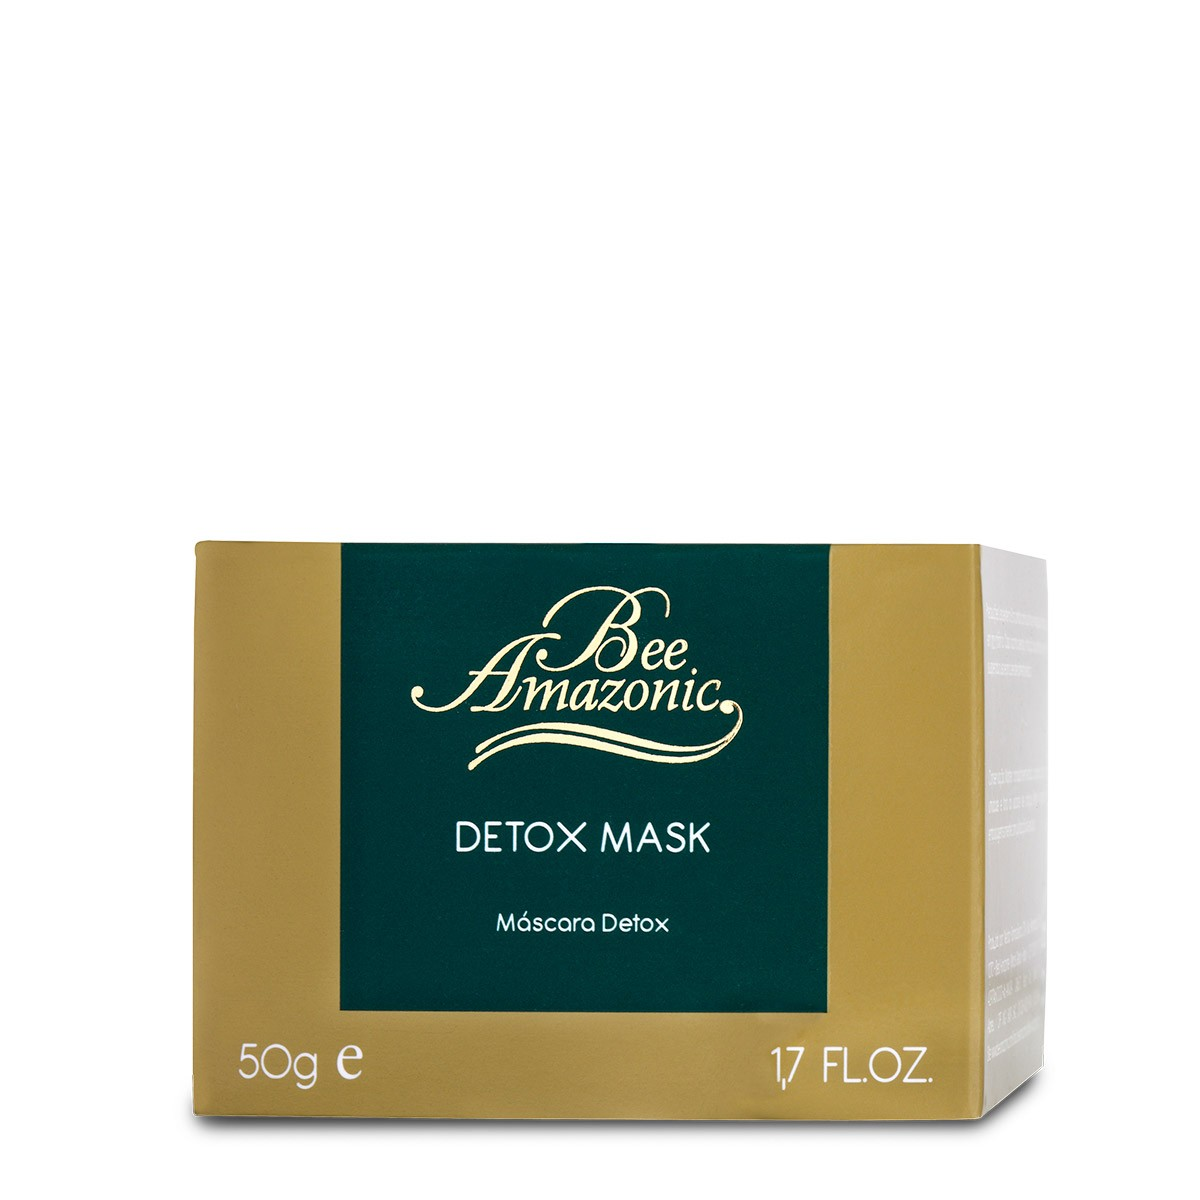 Detox Mask - Máscara Detox Bee Amazonic 50g (Vencimento 03/2021)